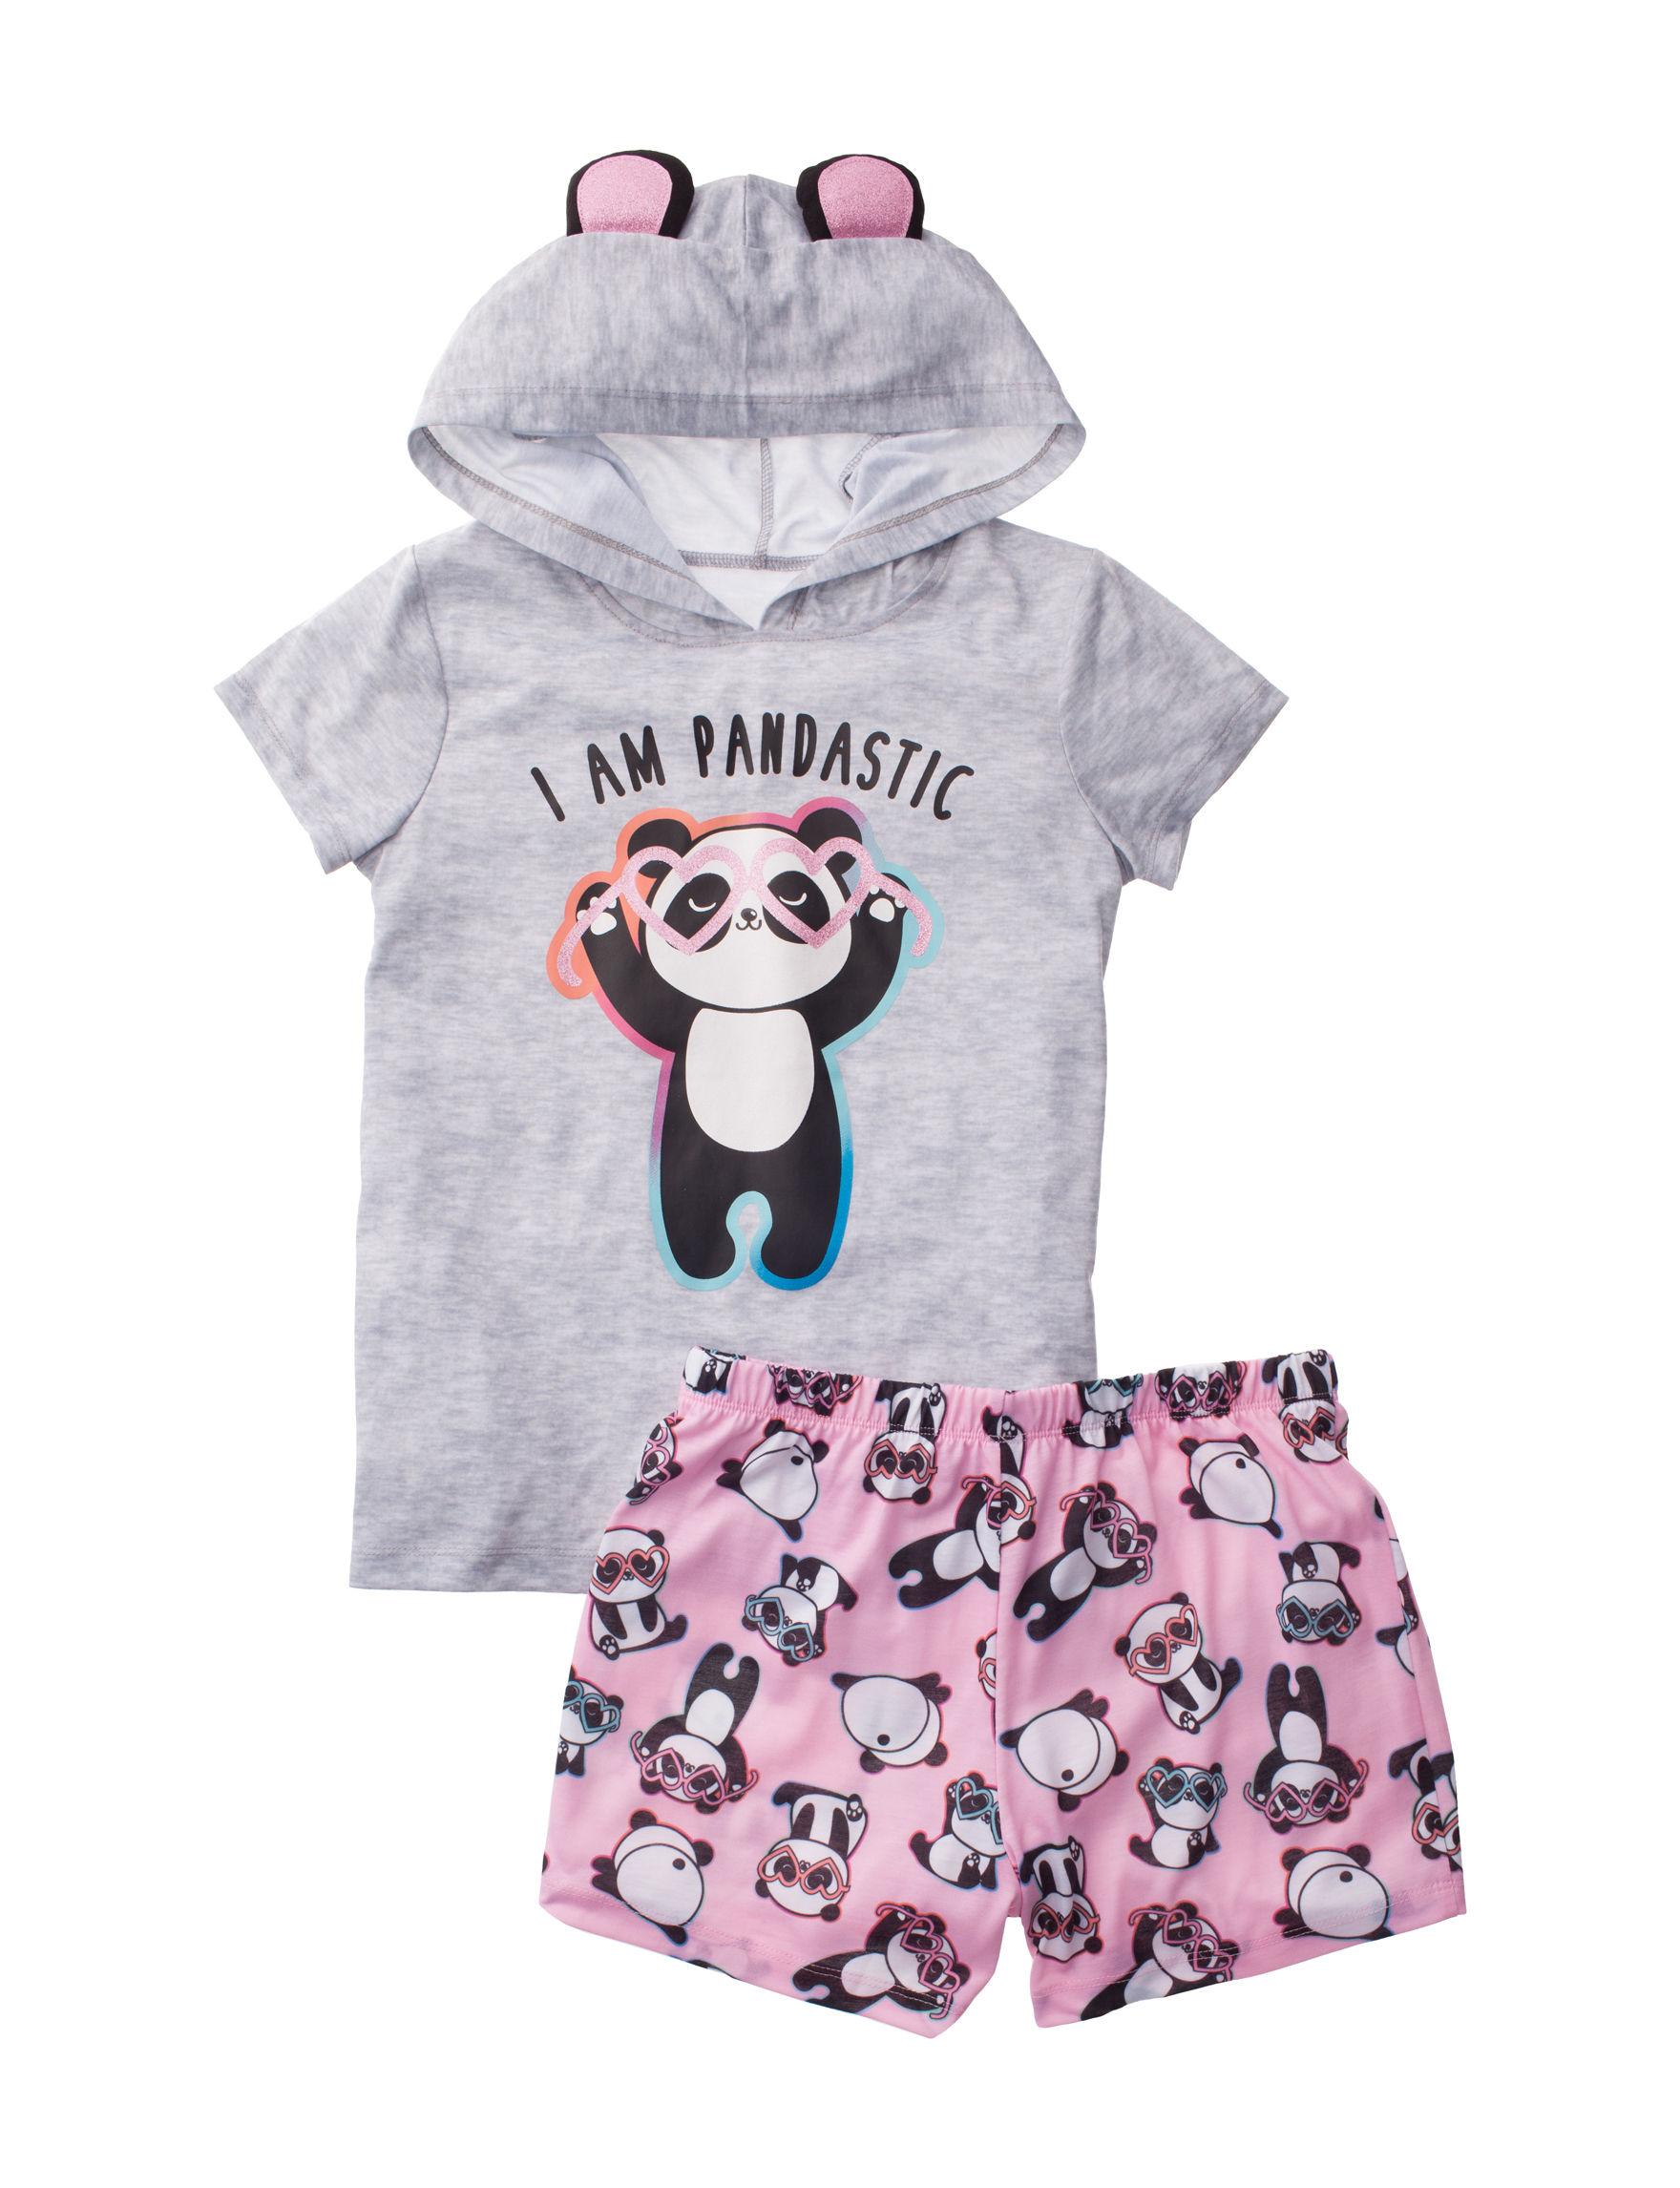 Peace Love & Dreams Grey / Pink Pajama Sets